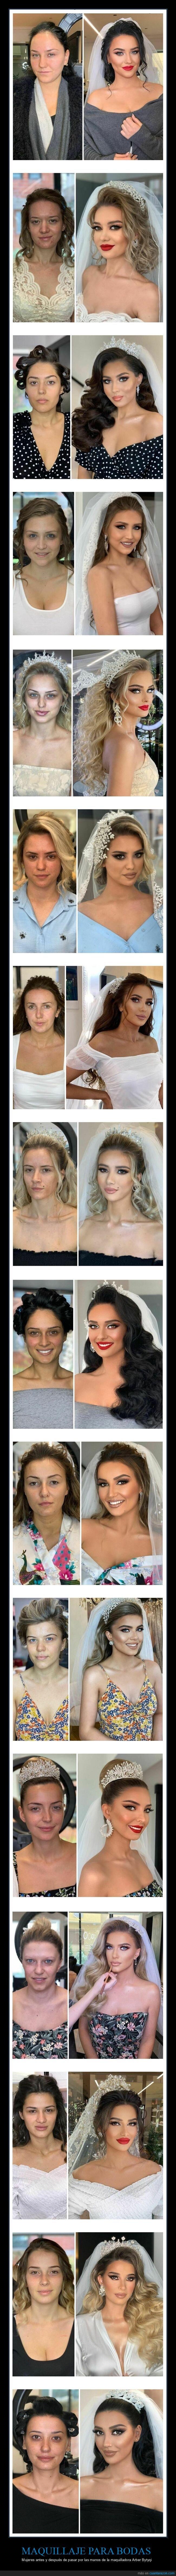 antes,arber bytyqi,boda,después,maquillaje